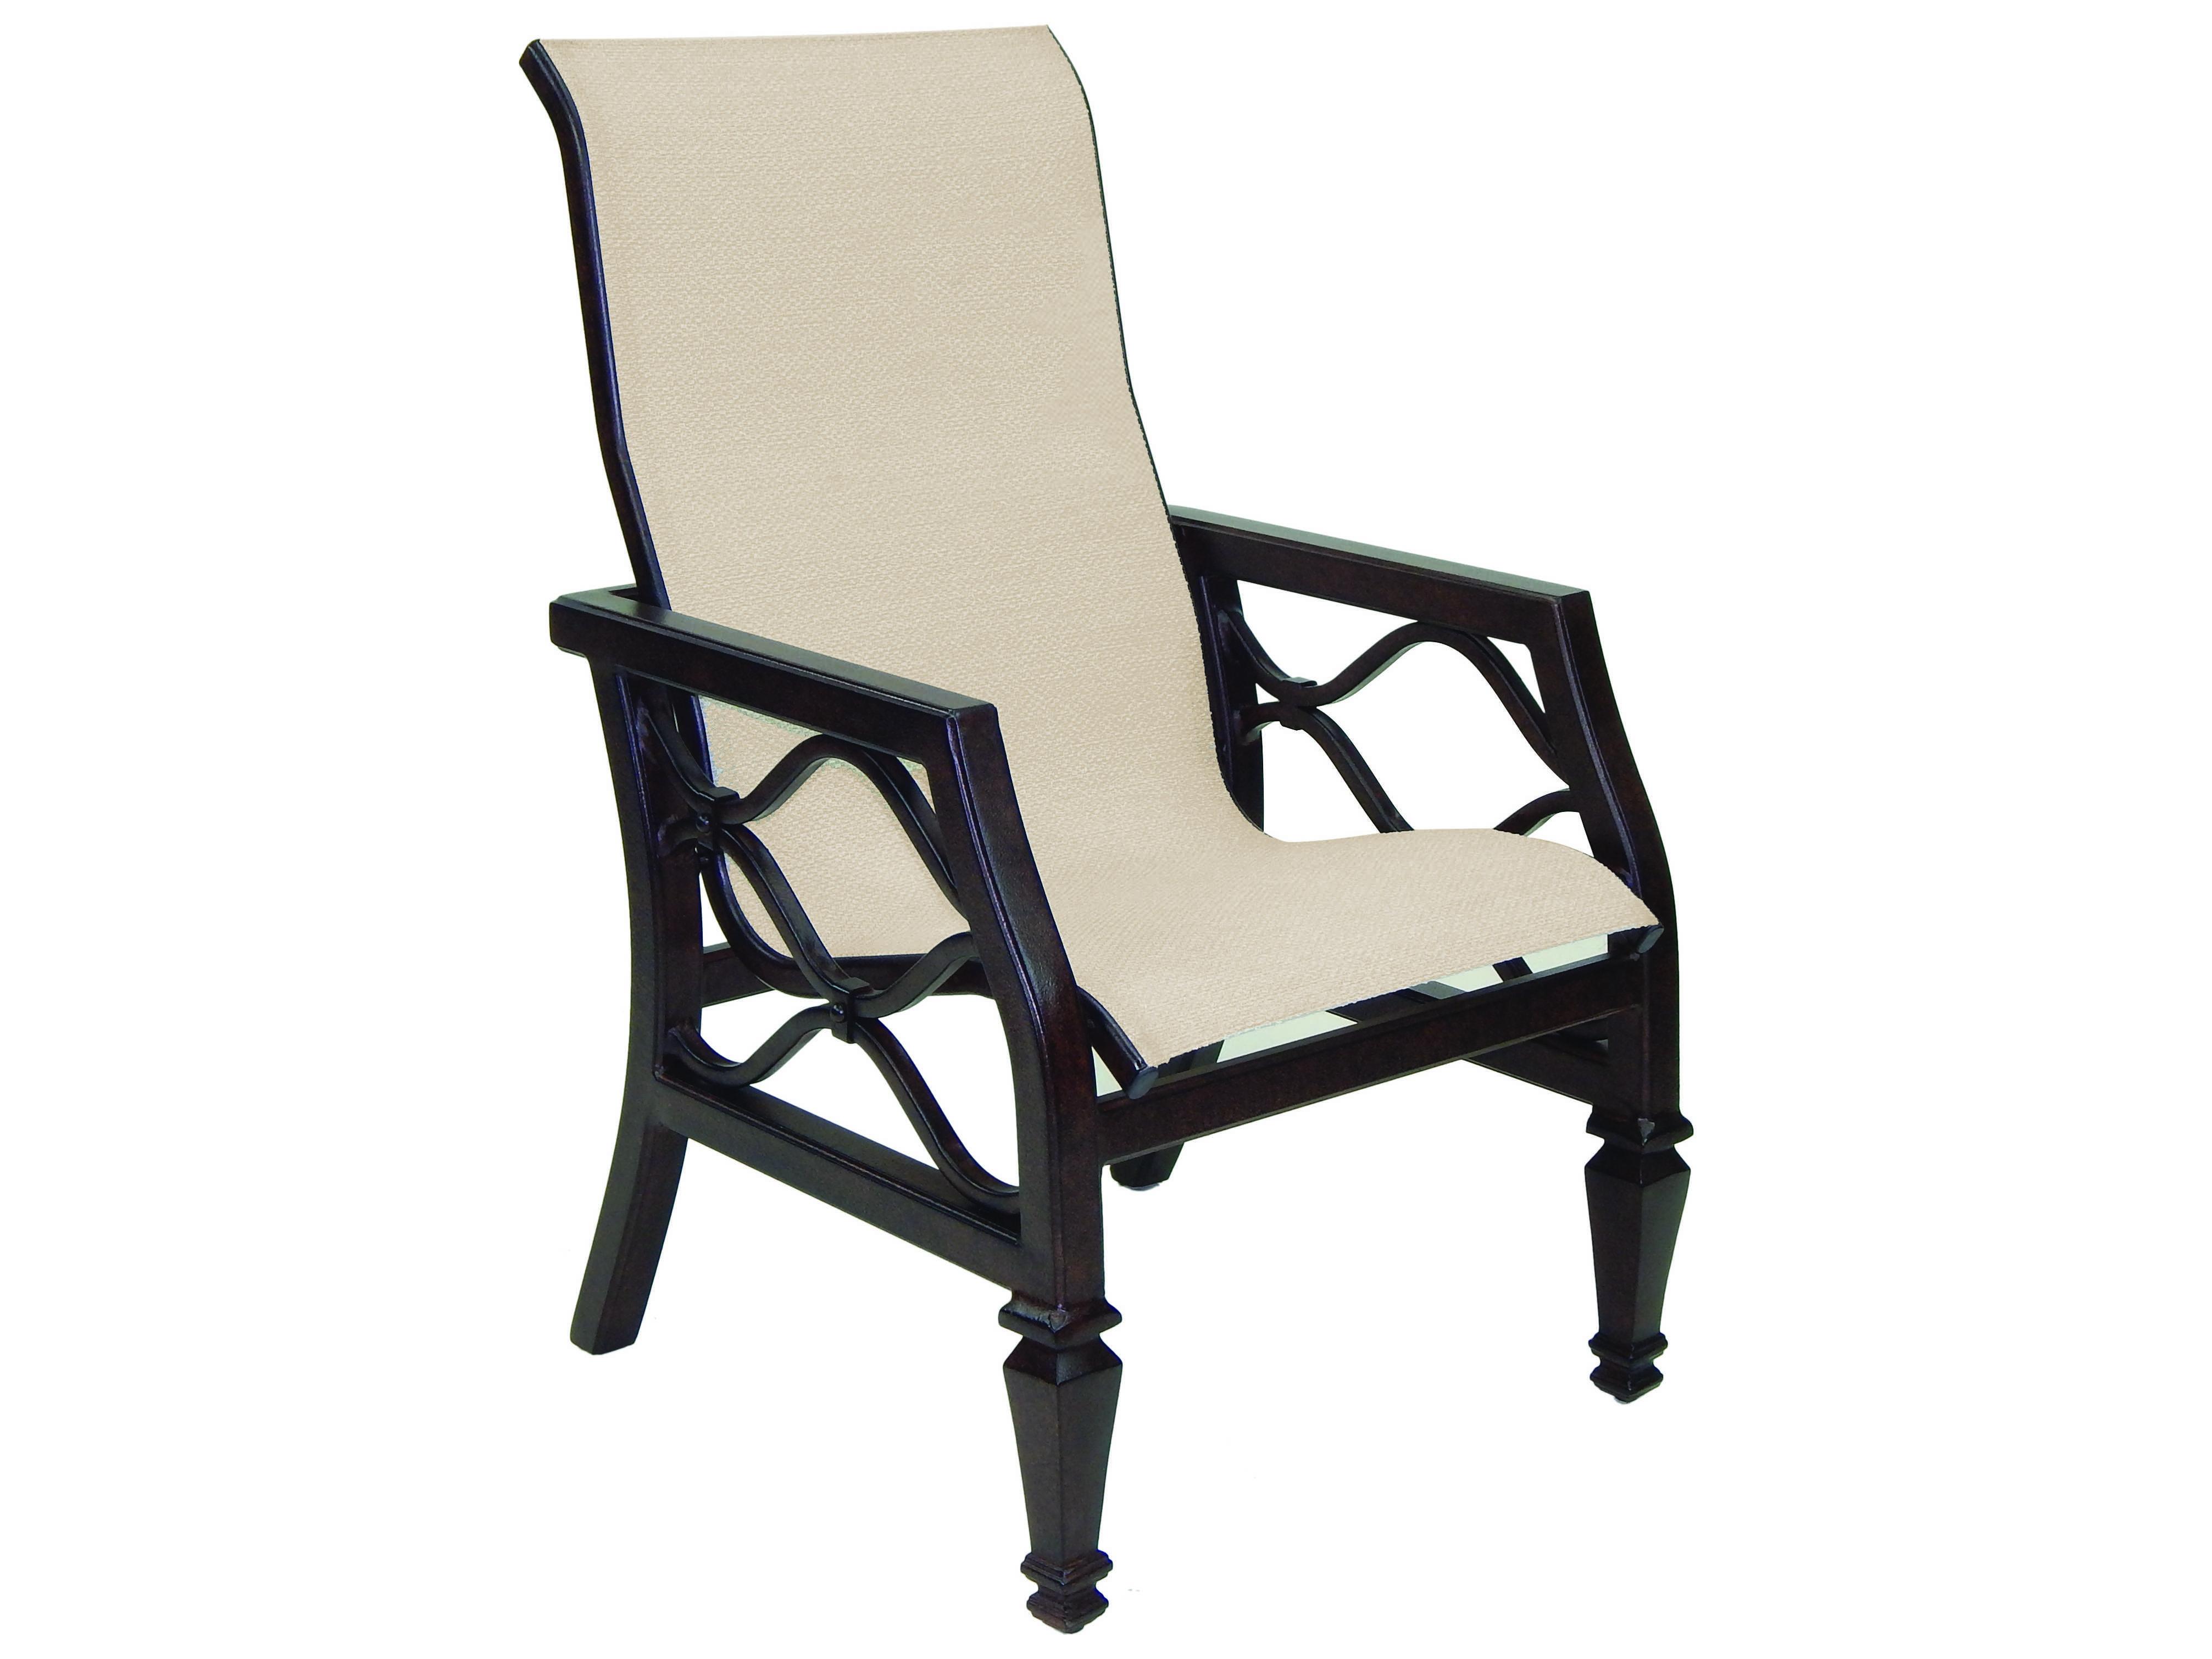 Castelle Villa Bianca Sling Cast Aluminum Dining Chair